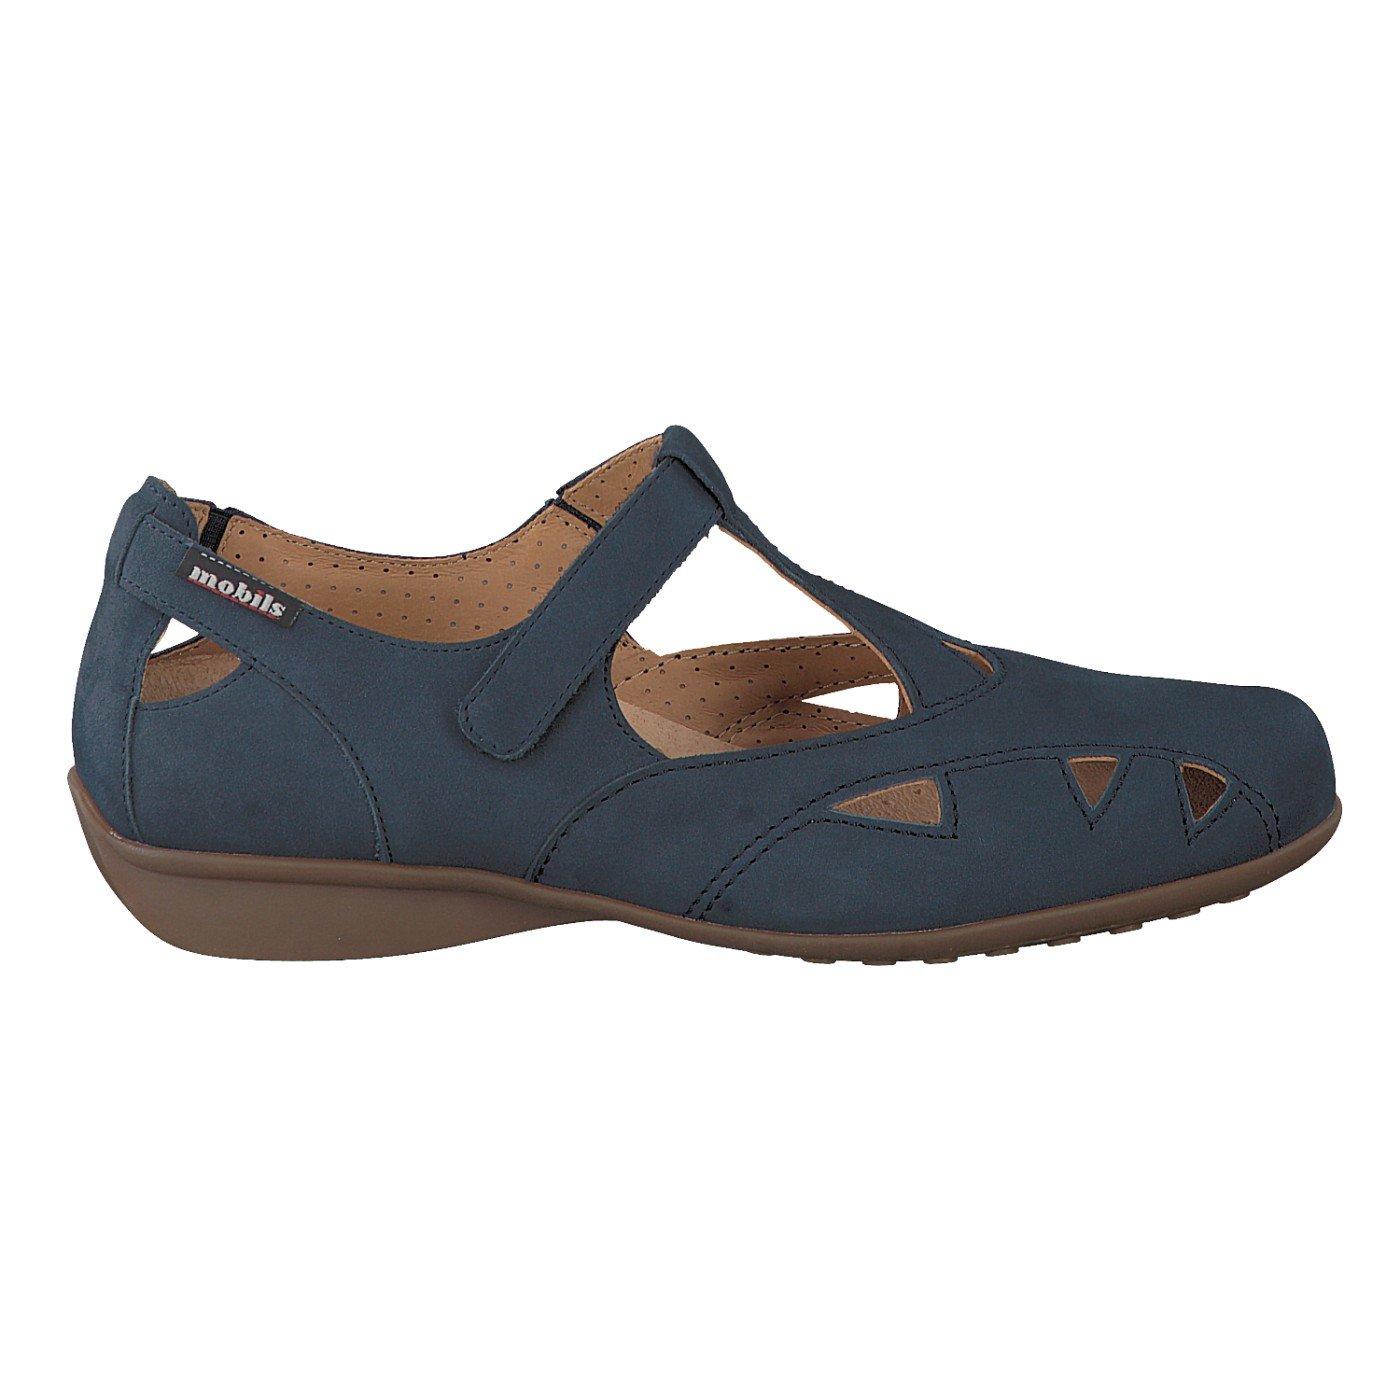 Bleu Marine Marine Marine Mephisto - Chaussures FANTINE - Bleu Marine c6a